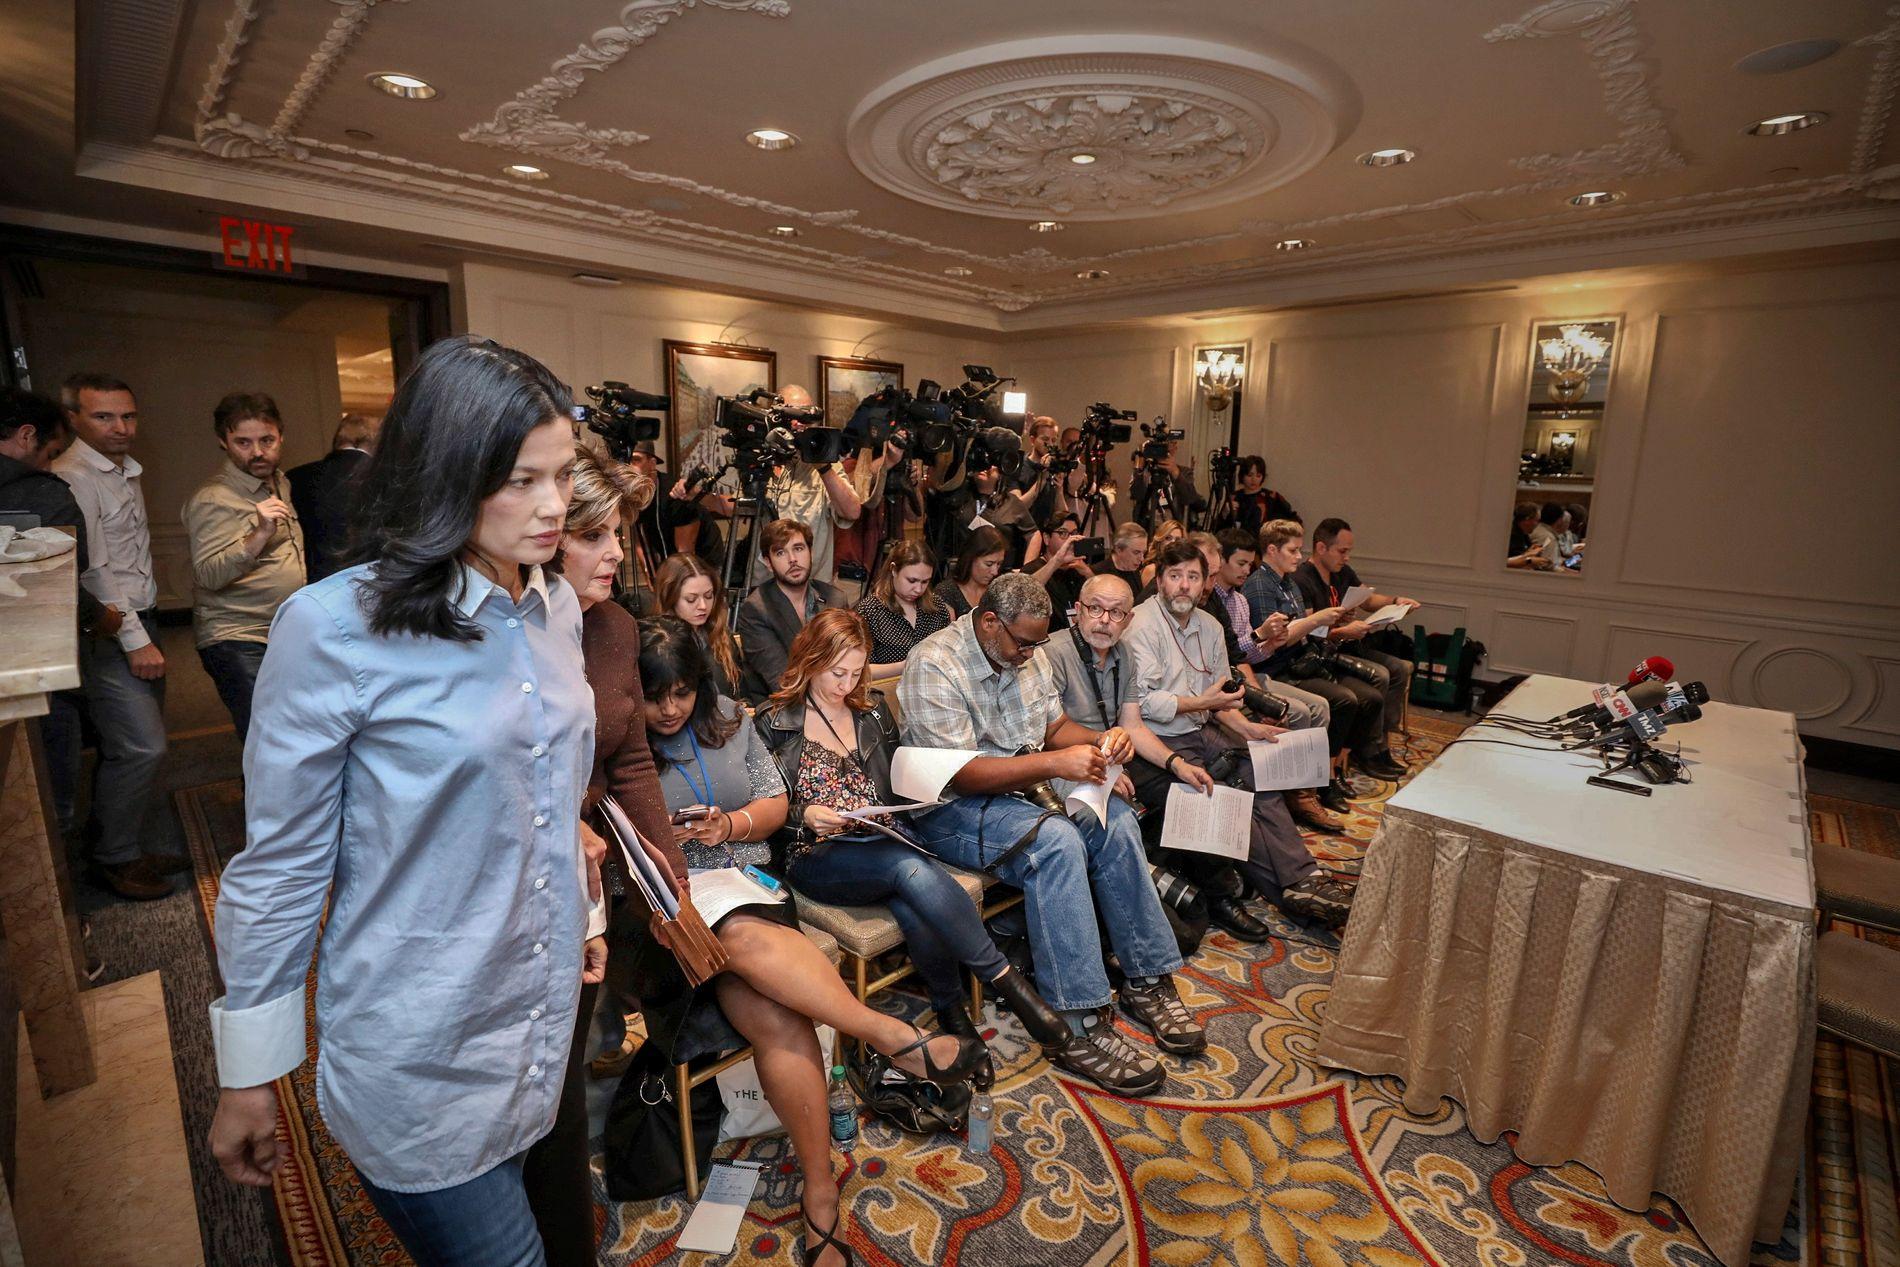 FORTALTE OM OVERGREP: Natassia Malthe holdt pressekonferanse onsdag kveld, norsk tid, i luksushotellet Lotte New York Palace Hotel.